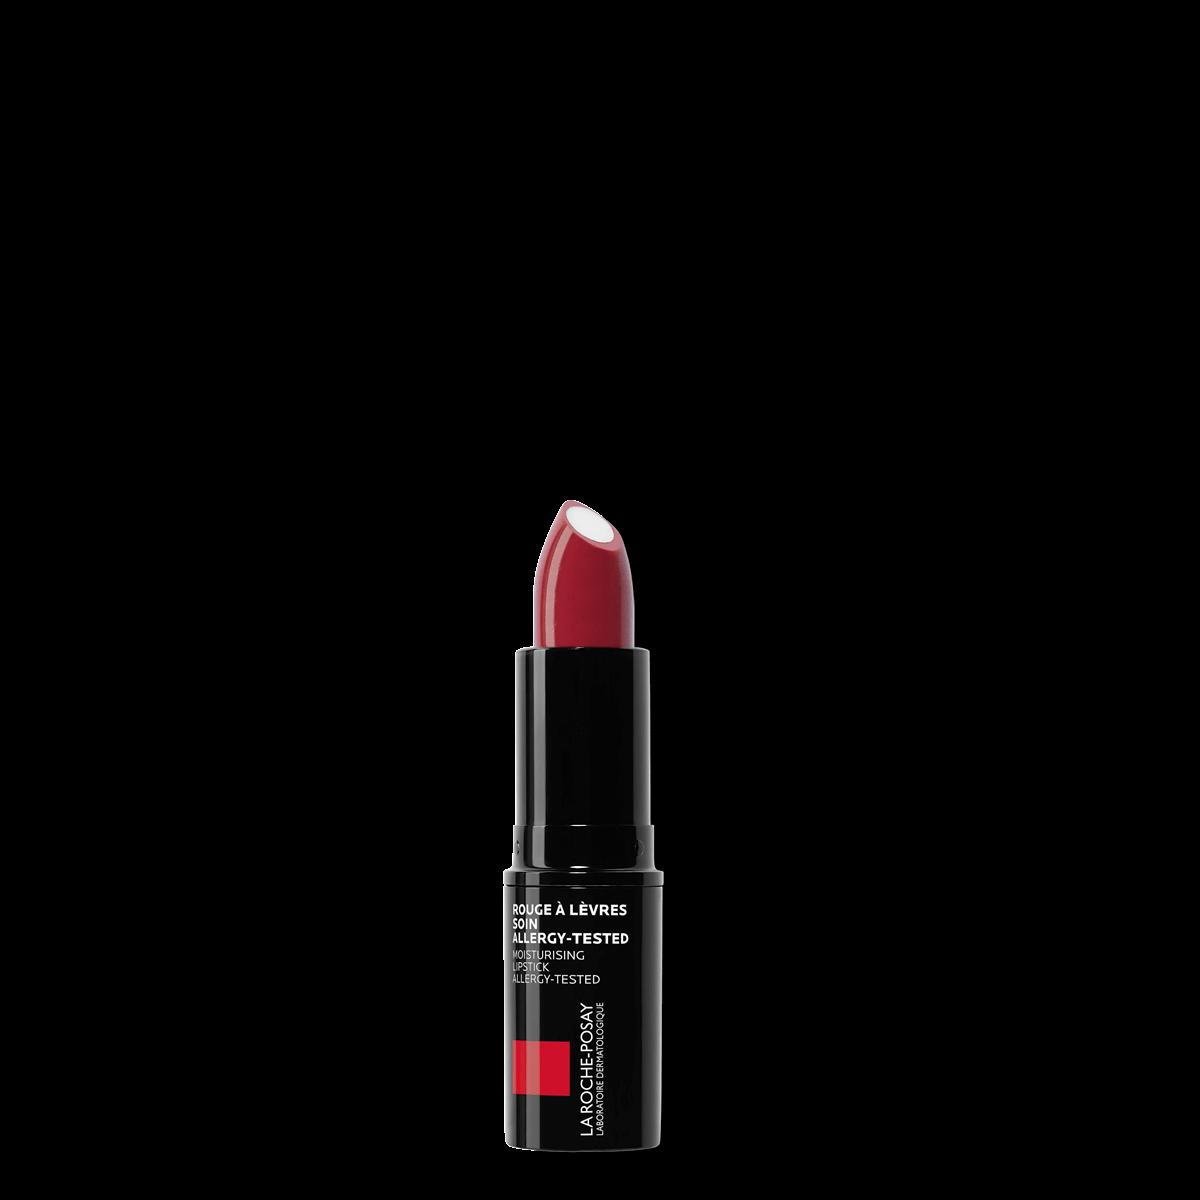 La Roche Posay Herkkä Toleriane Make up NOVALIP 158Cassisnocturne 3